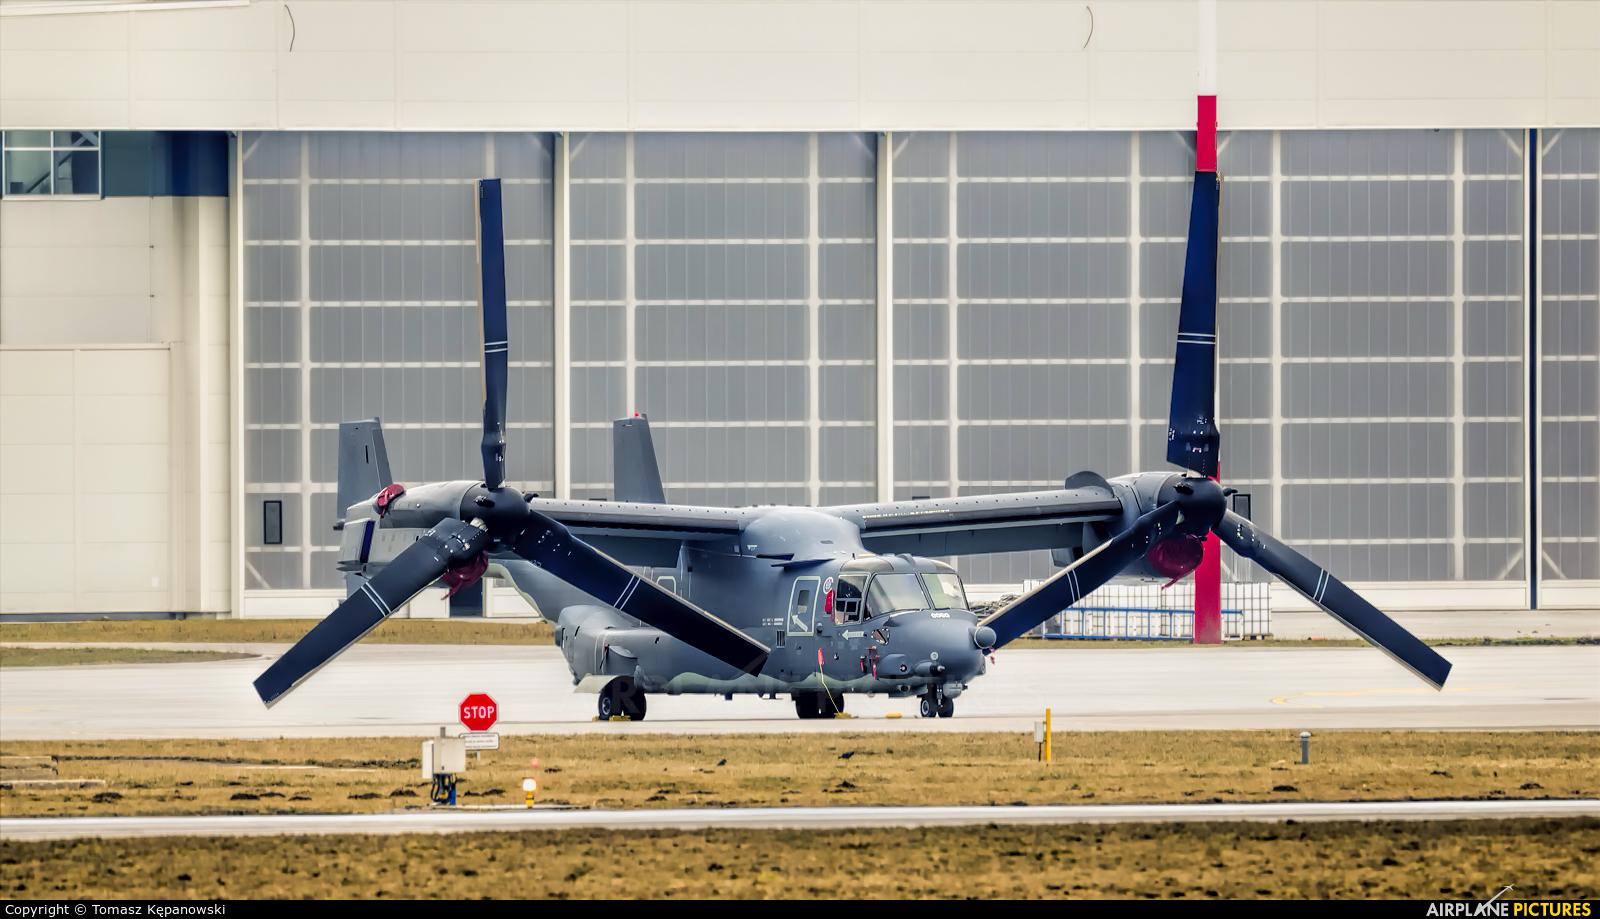 USA - Air Force 10-0050 aircraft at Kraków - John Paul II Intl